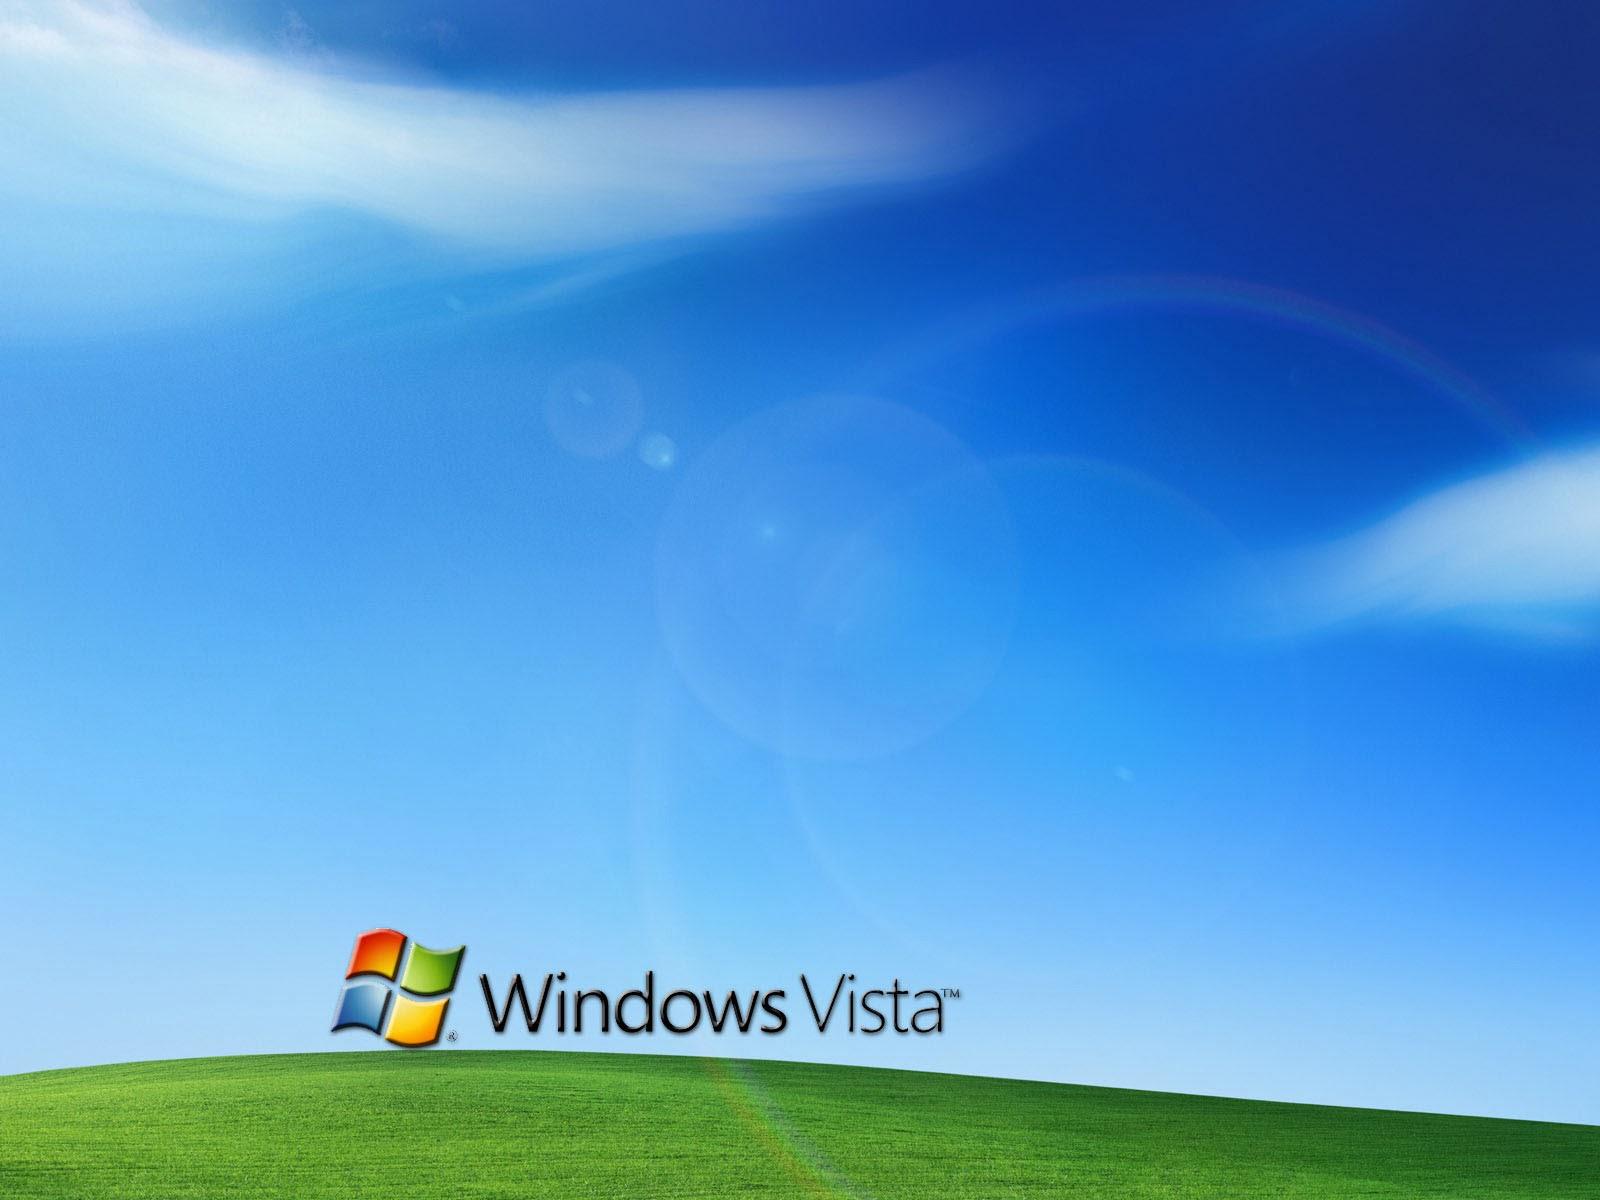 Cute Donald Duck Wallpapers Wallpapers Windows Vista Bliss Wallpapers